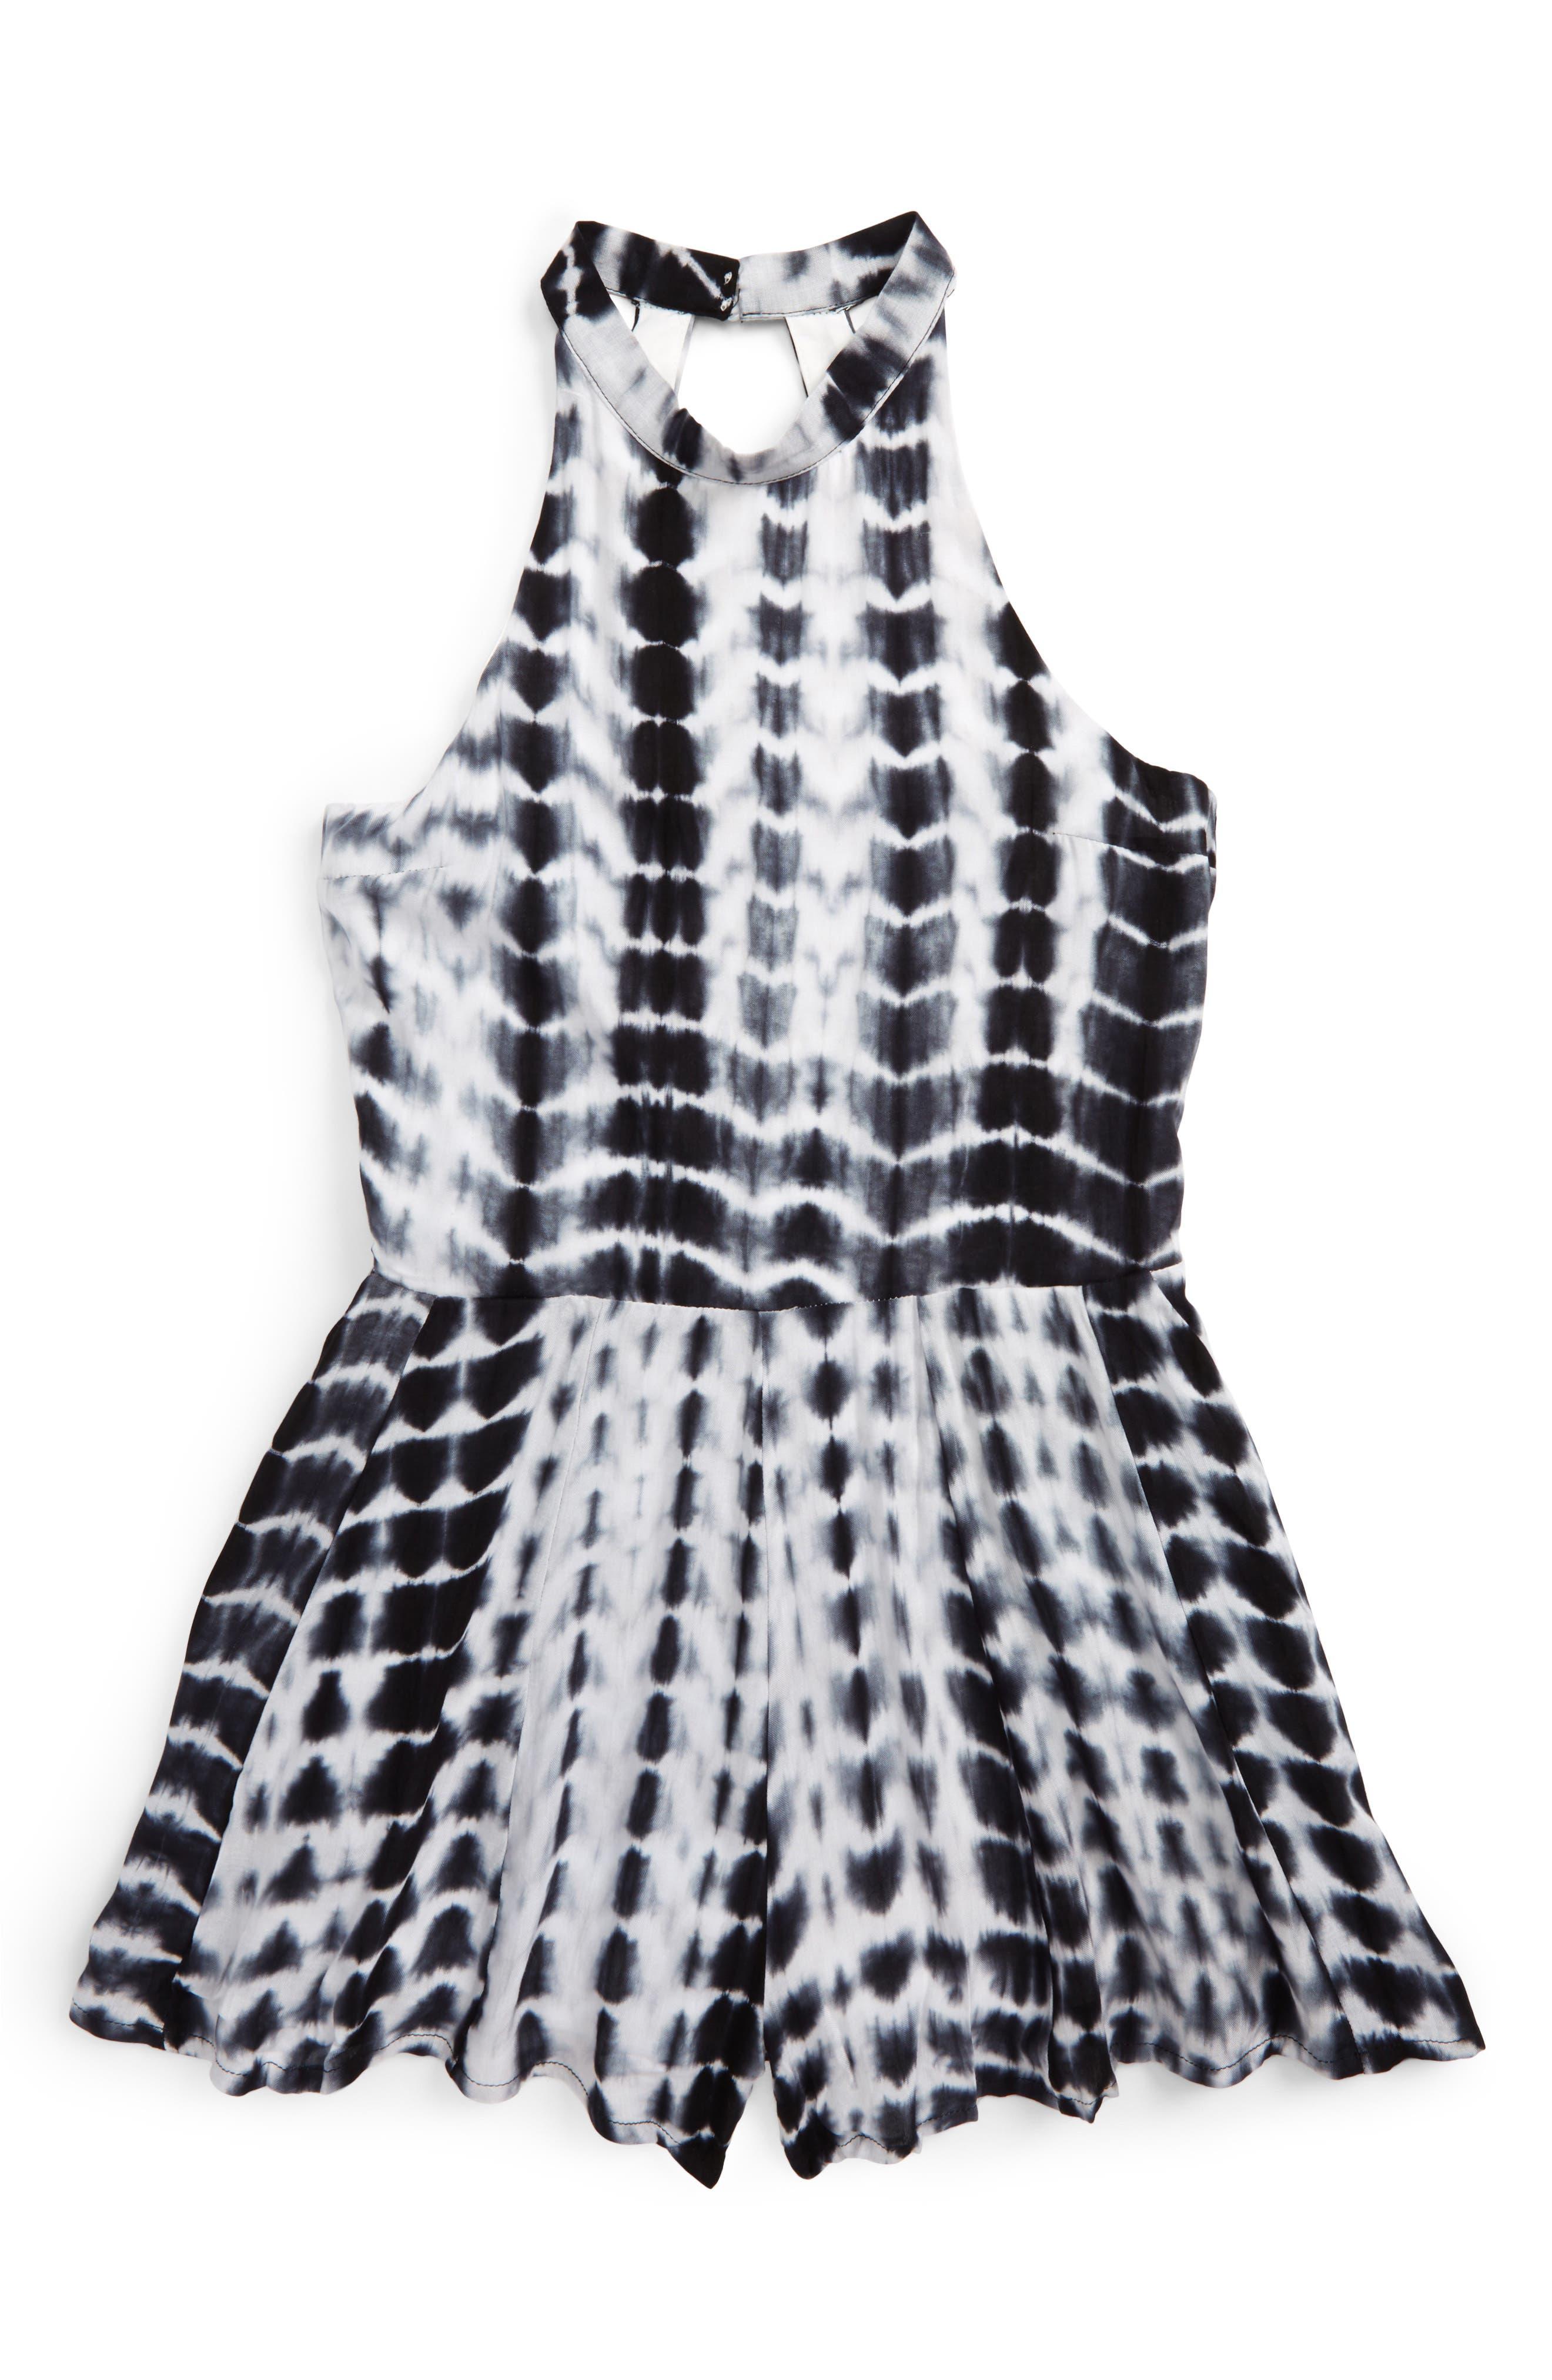 Alternate Image 1 Selected - Miss Behave Safira Tie Dye Print Romper (Big Girls)